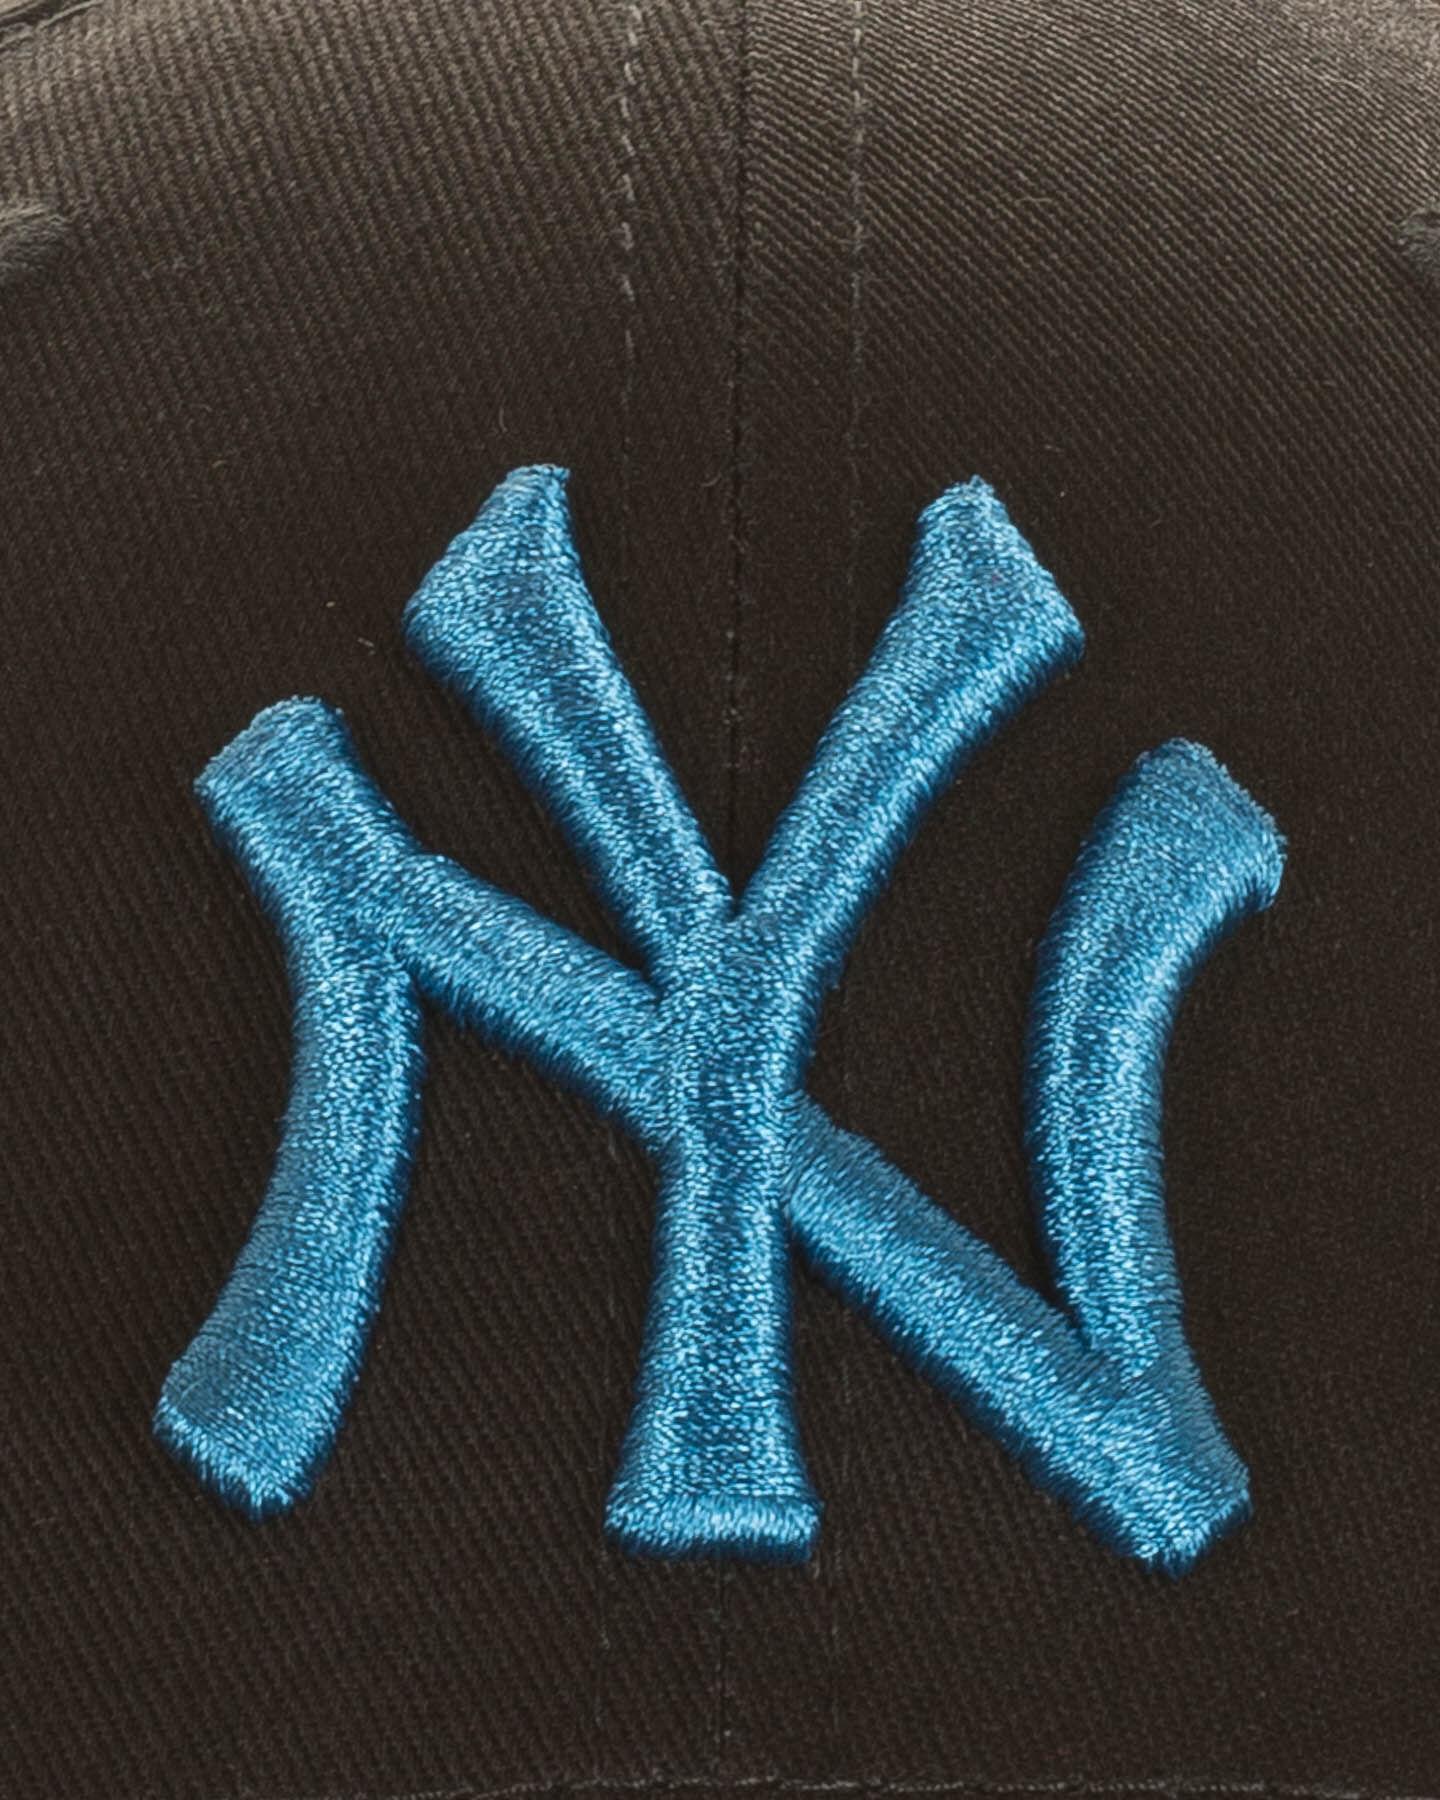 Cappellino NEW ERA 9FORTY NEW YORK YANKEES  S5239032 001 OSFM scatto 2